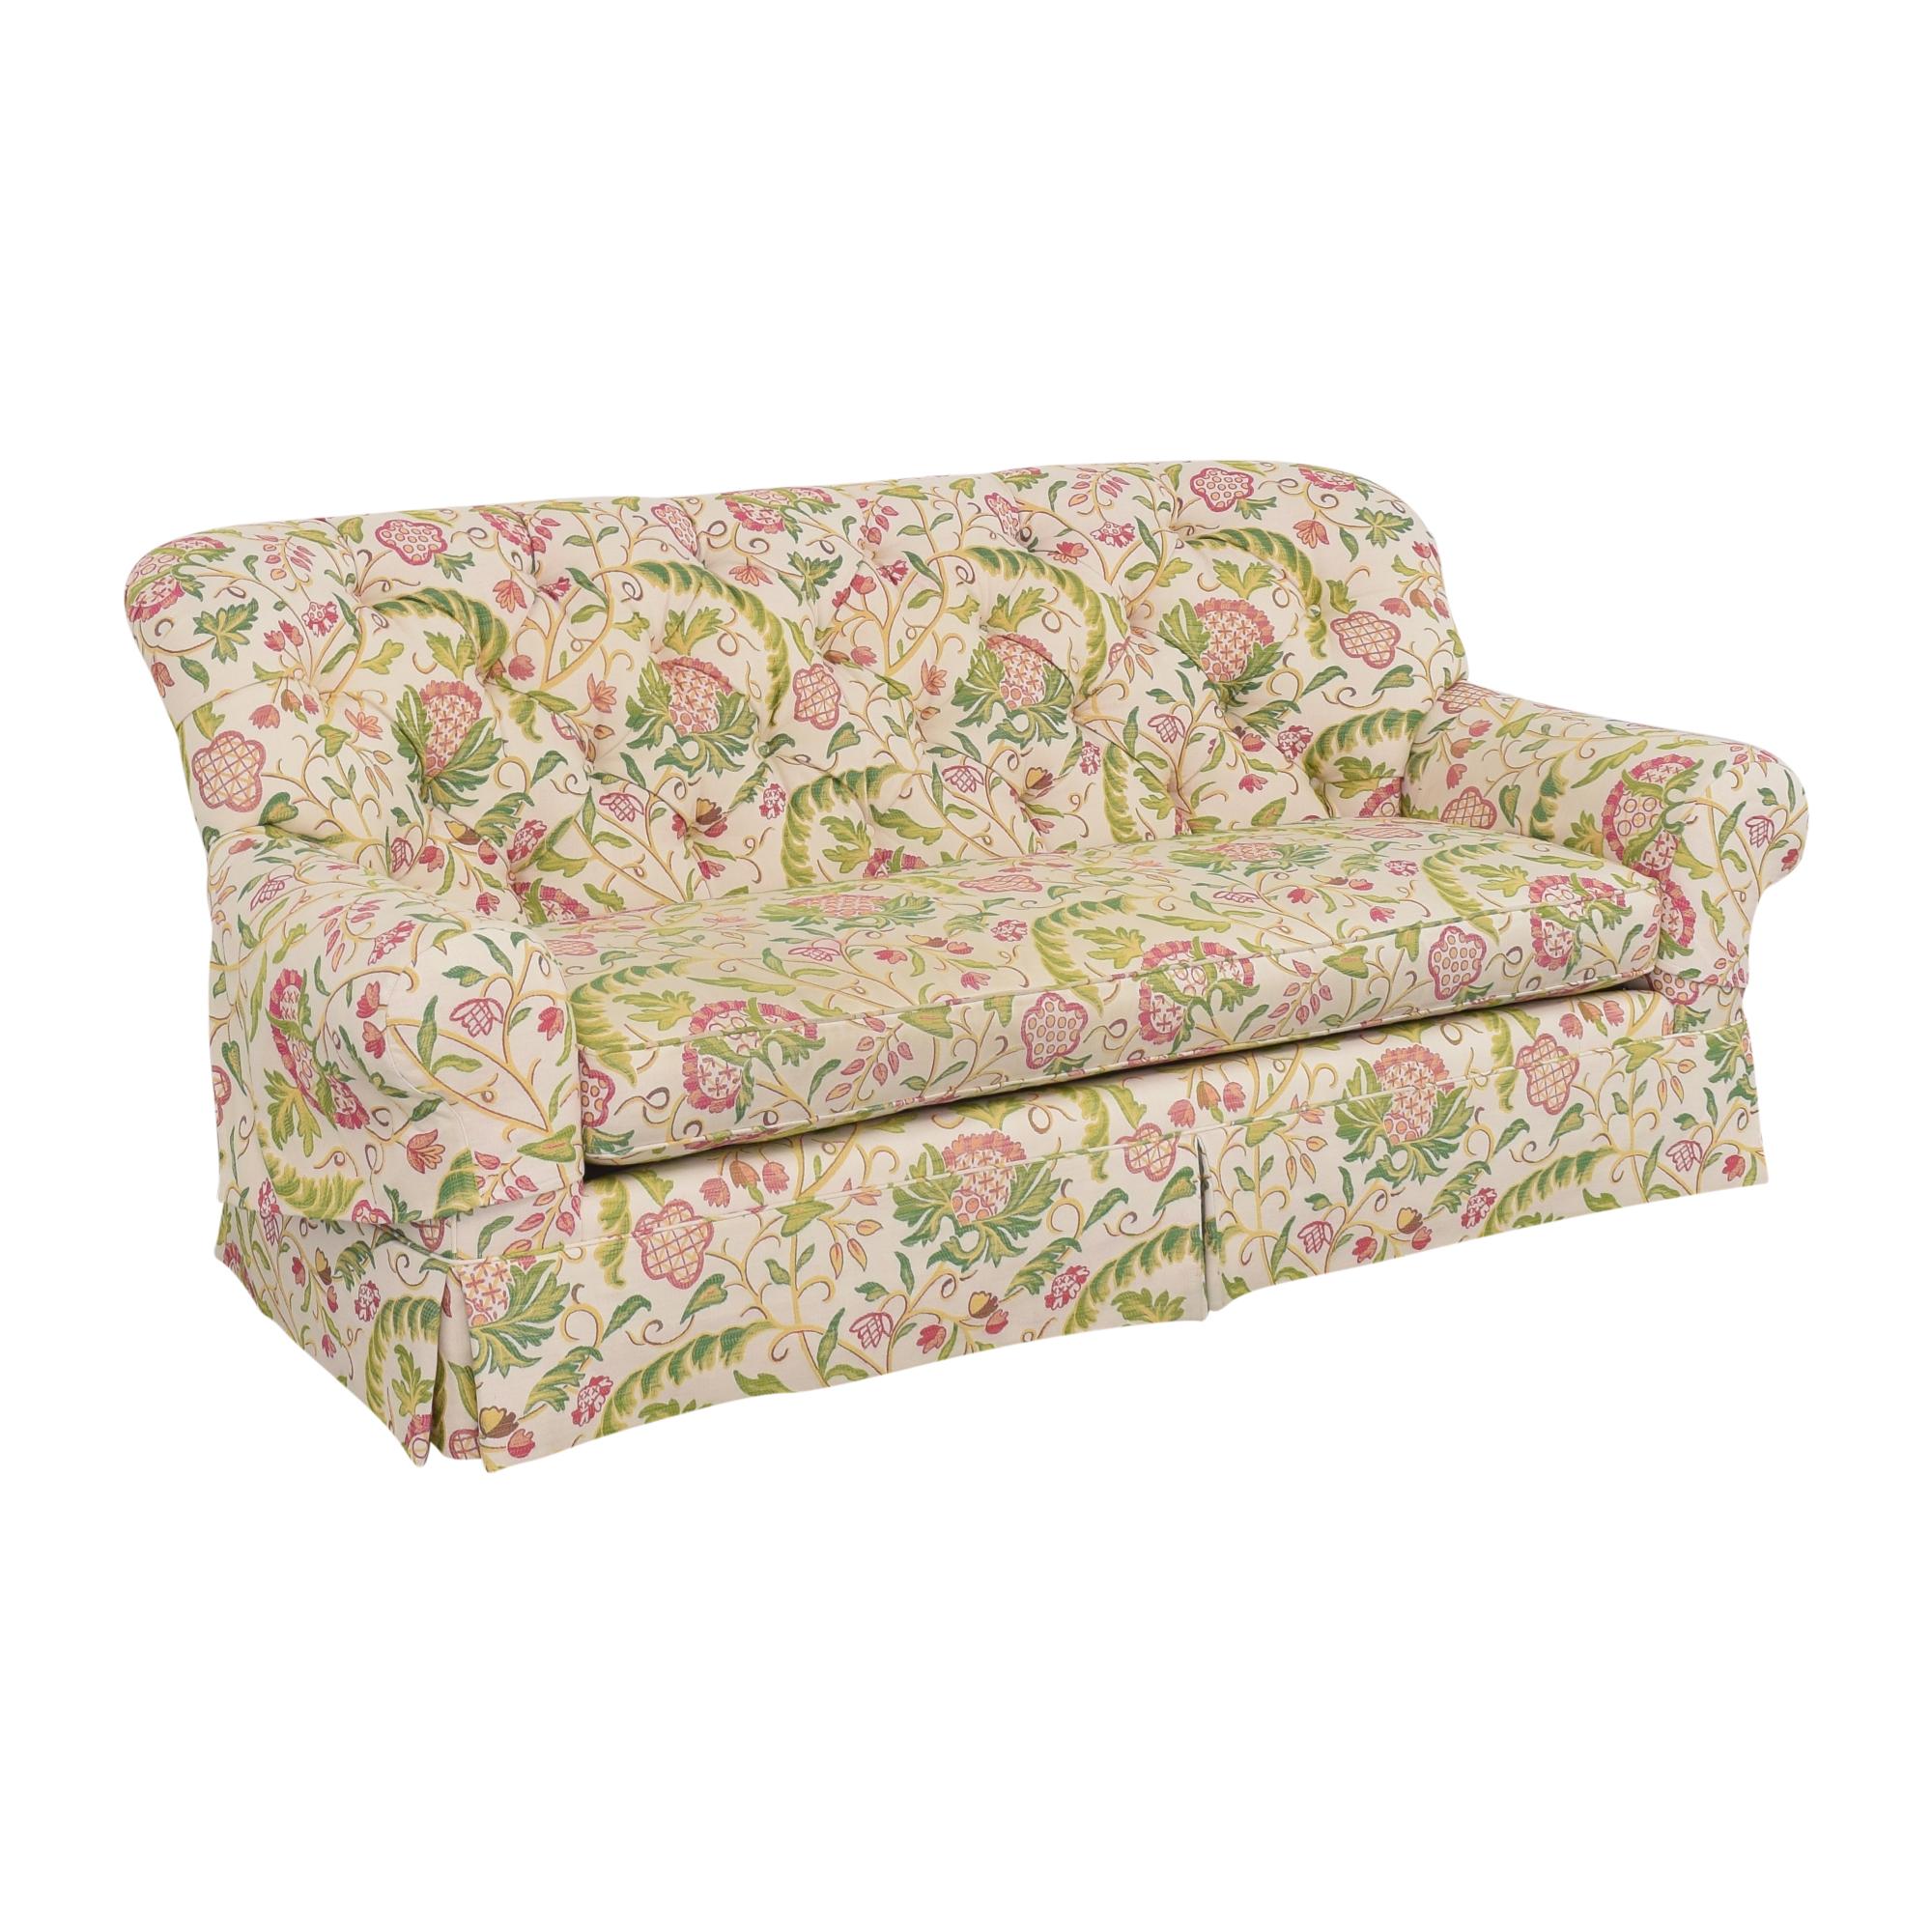 Stickley Furniture Stickley Furniture Custom Upholstered Sofa coupon